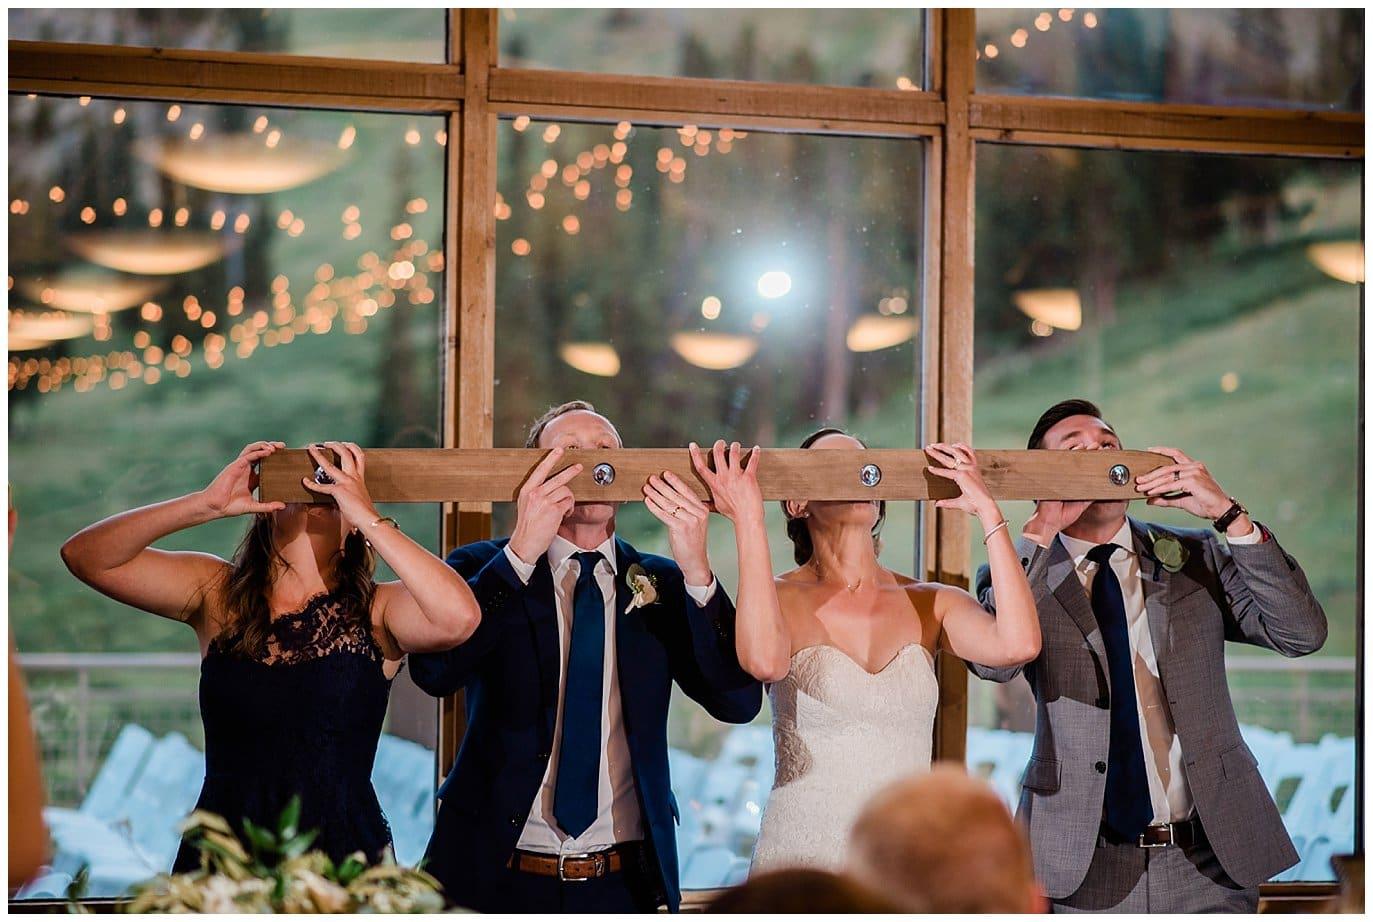 bride and groom do shot ski at Arapahoe Basin Black Mountain Lodge Wedding by Arapahoe Basin Wedding Photographer Jennie Crate